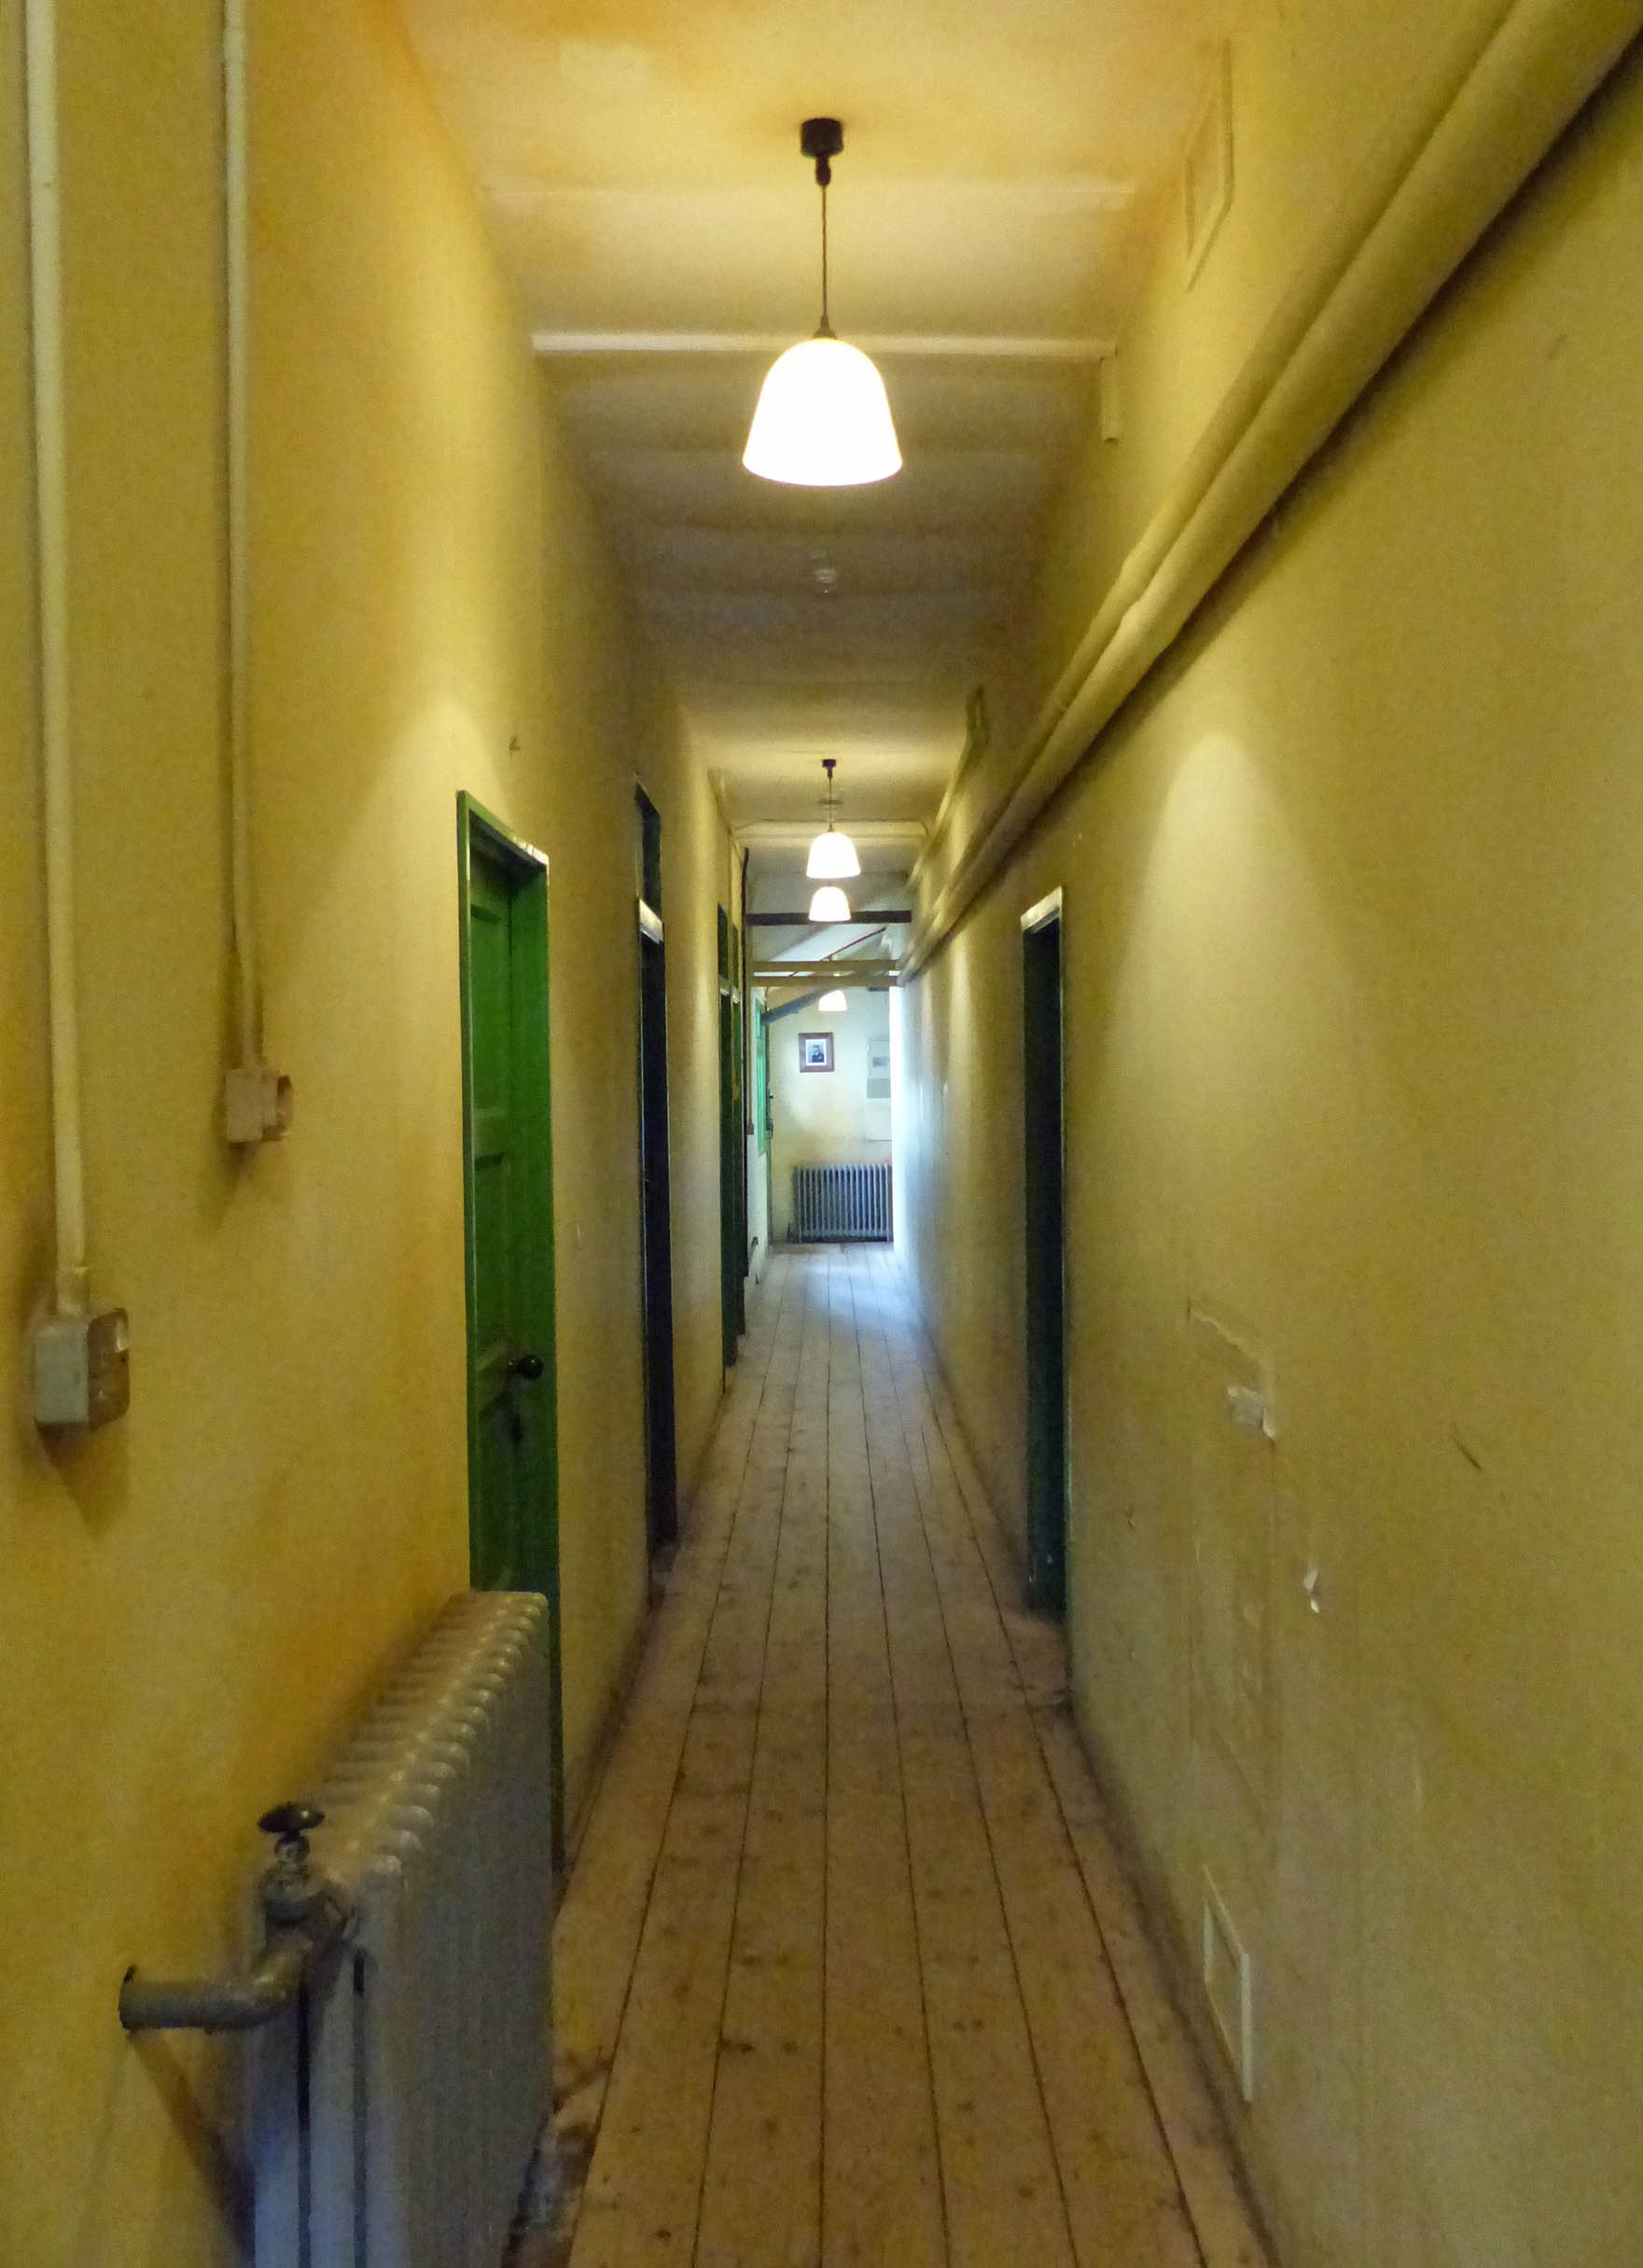 Narrow corridor with yellow walls